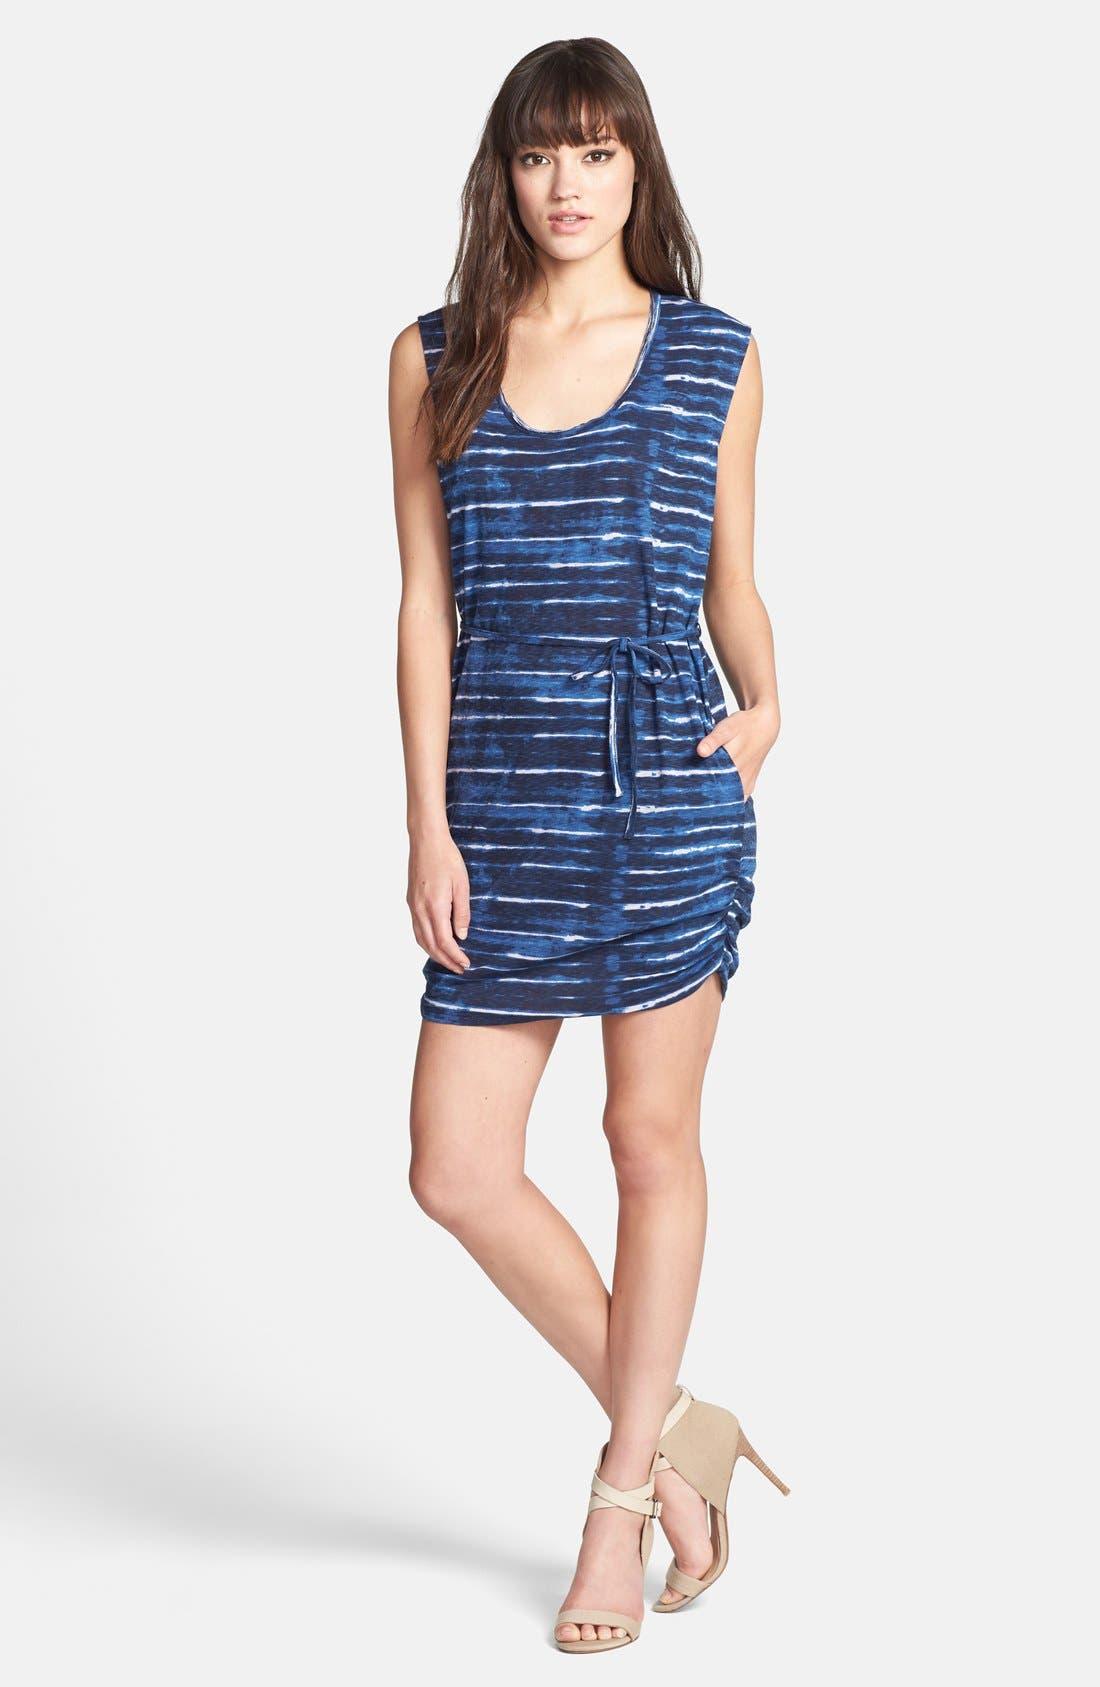 Main Image - Soft Joie 'Jute' Tie Dye Cotton Dress